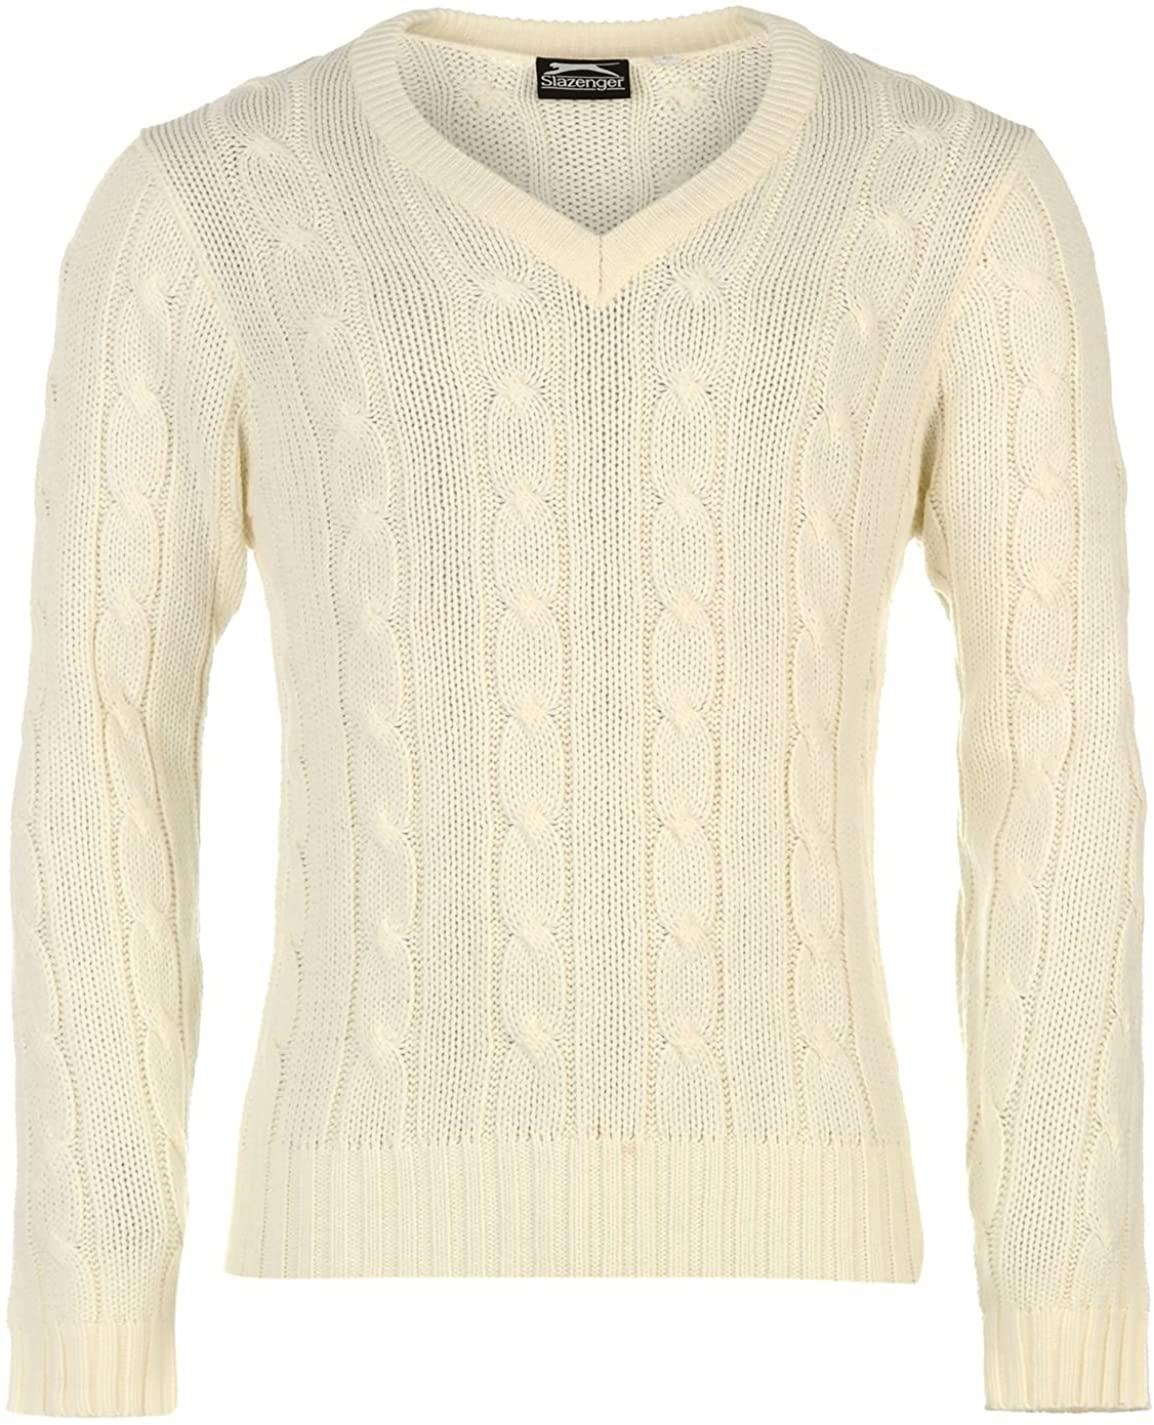 Slazenger Mens Classic Sweater Cricket Sports Jumper V Neck Long Sleeve Top